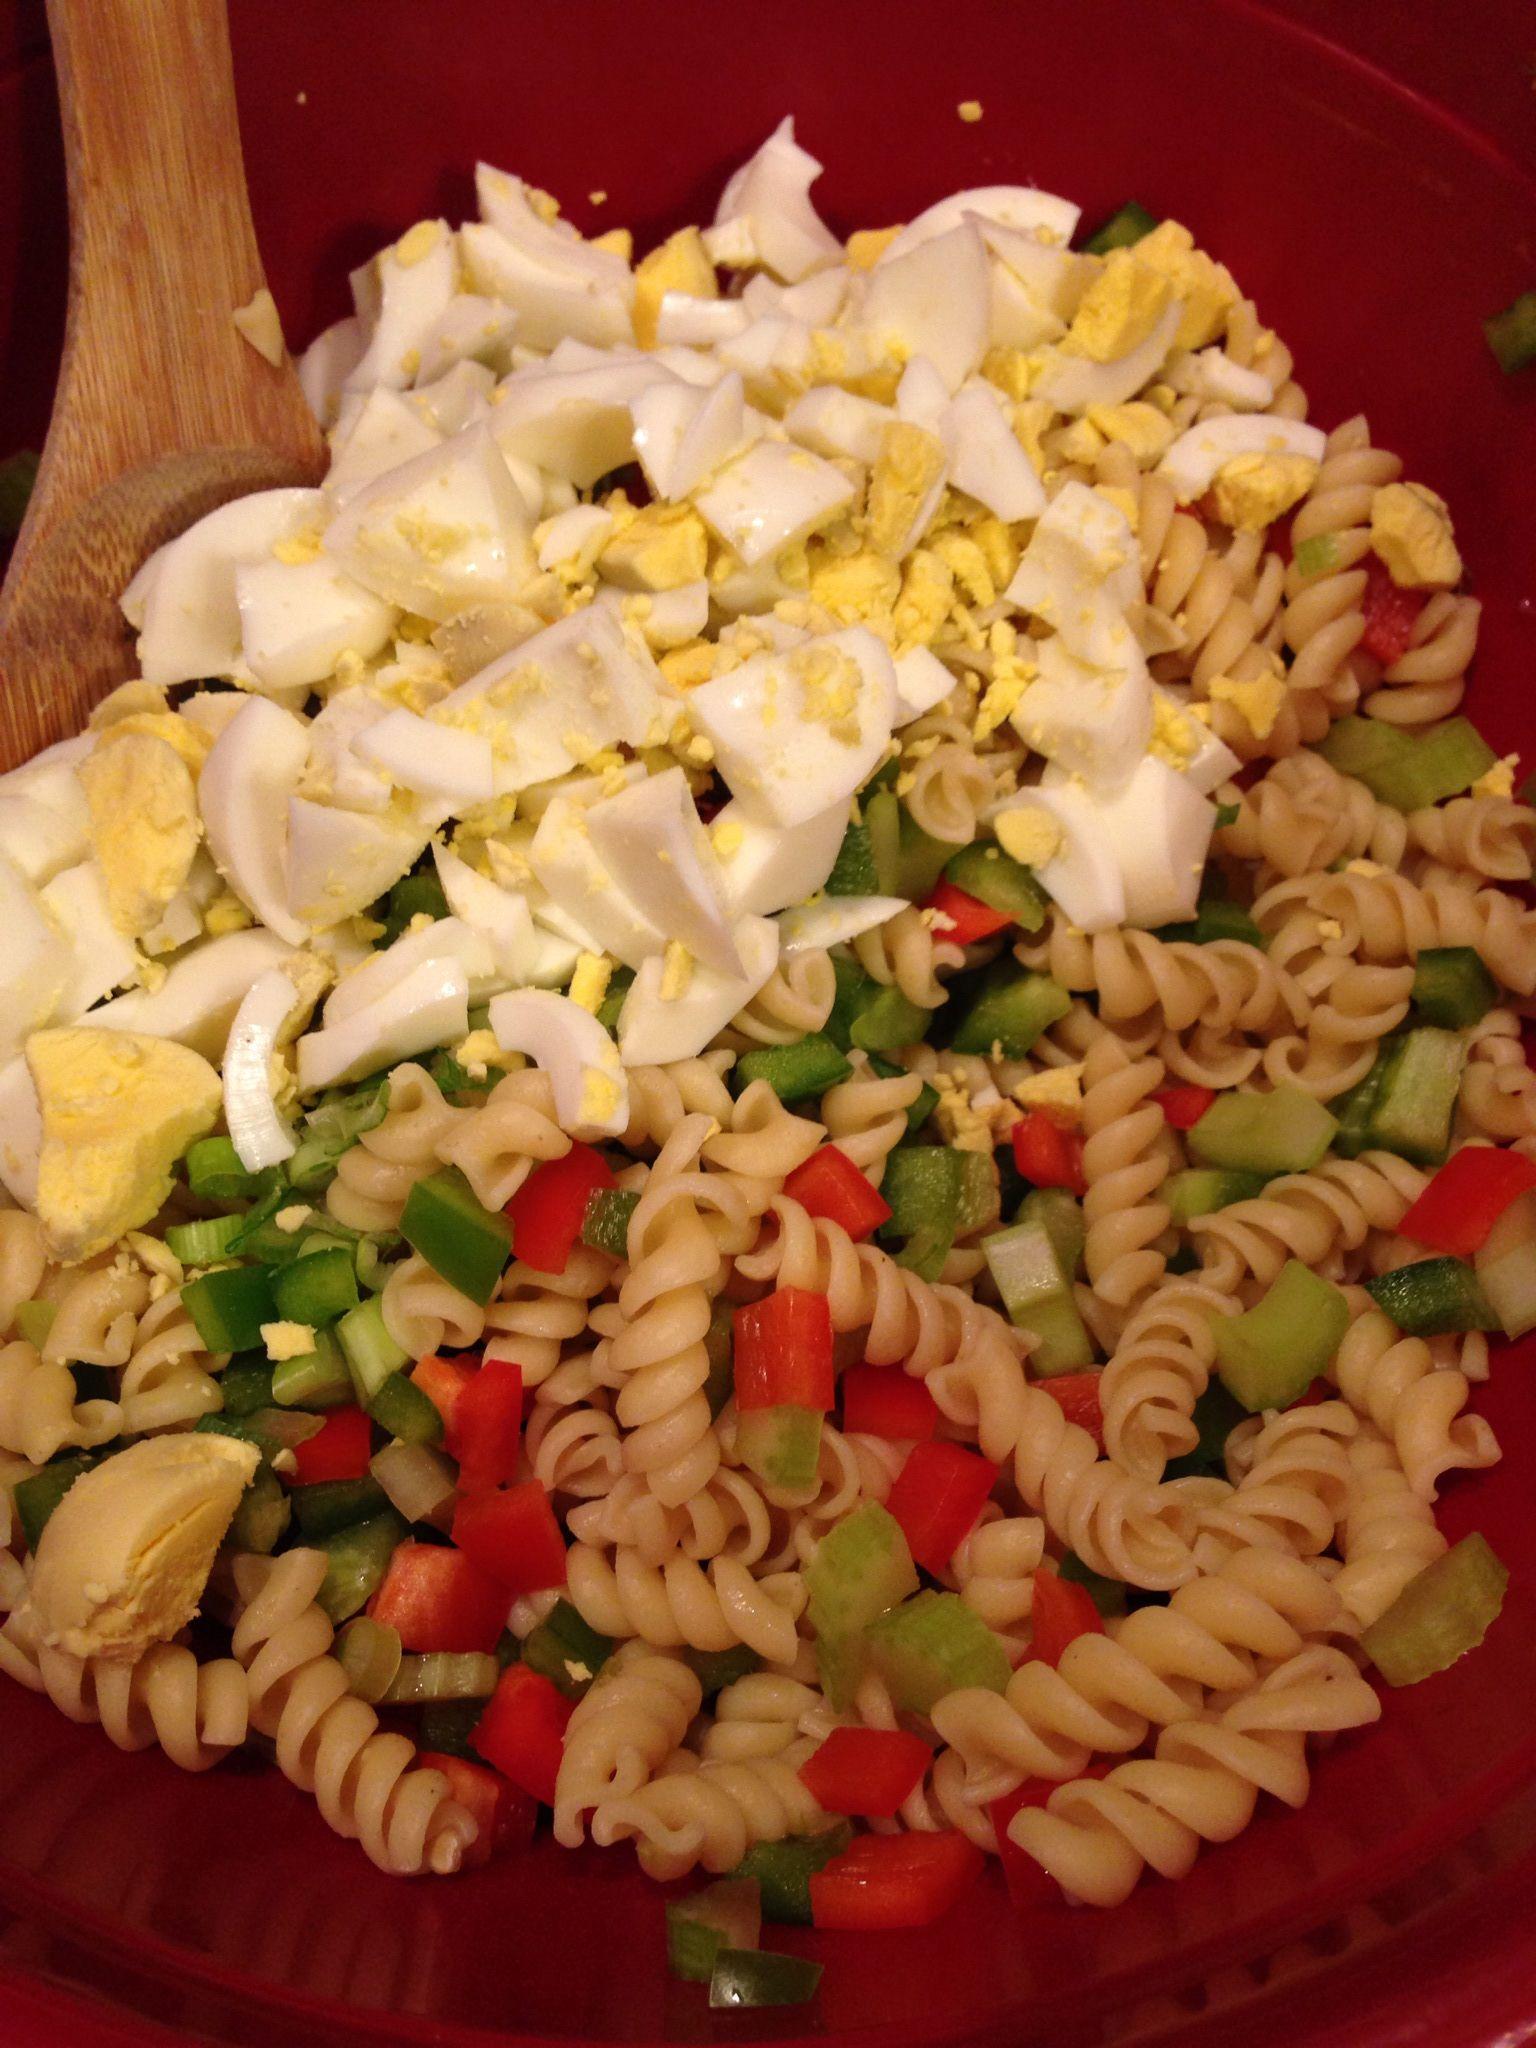 Festive Pasta Salad (THM S)   Recipe   Pasta salad, Pasta, Summer side dishes